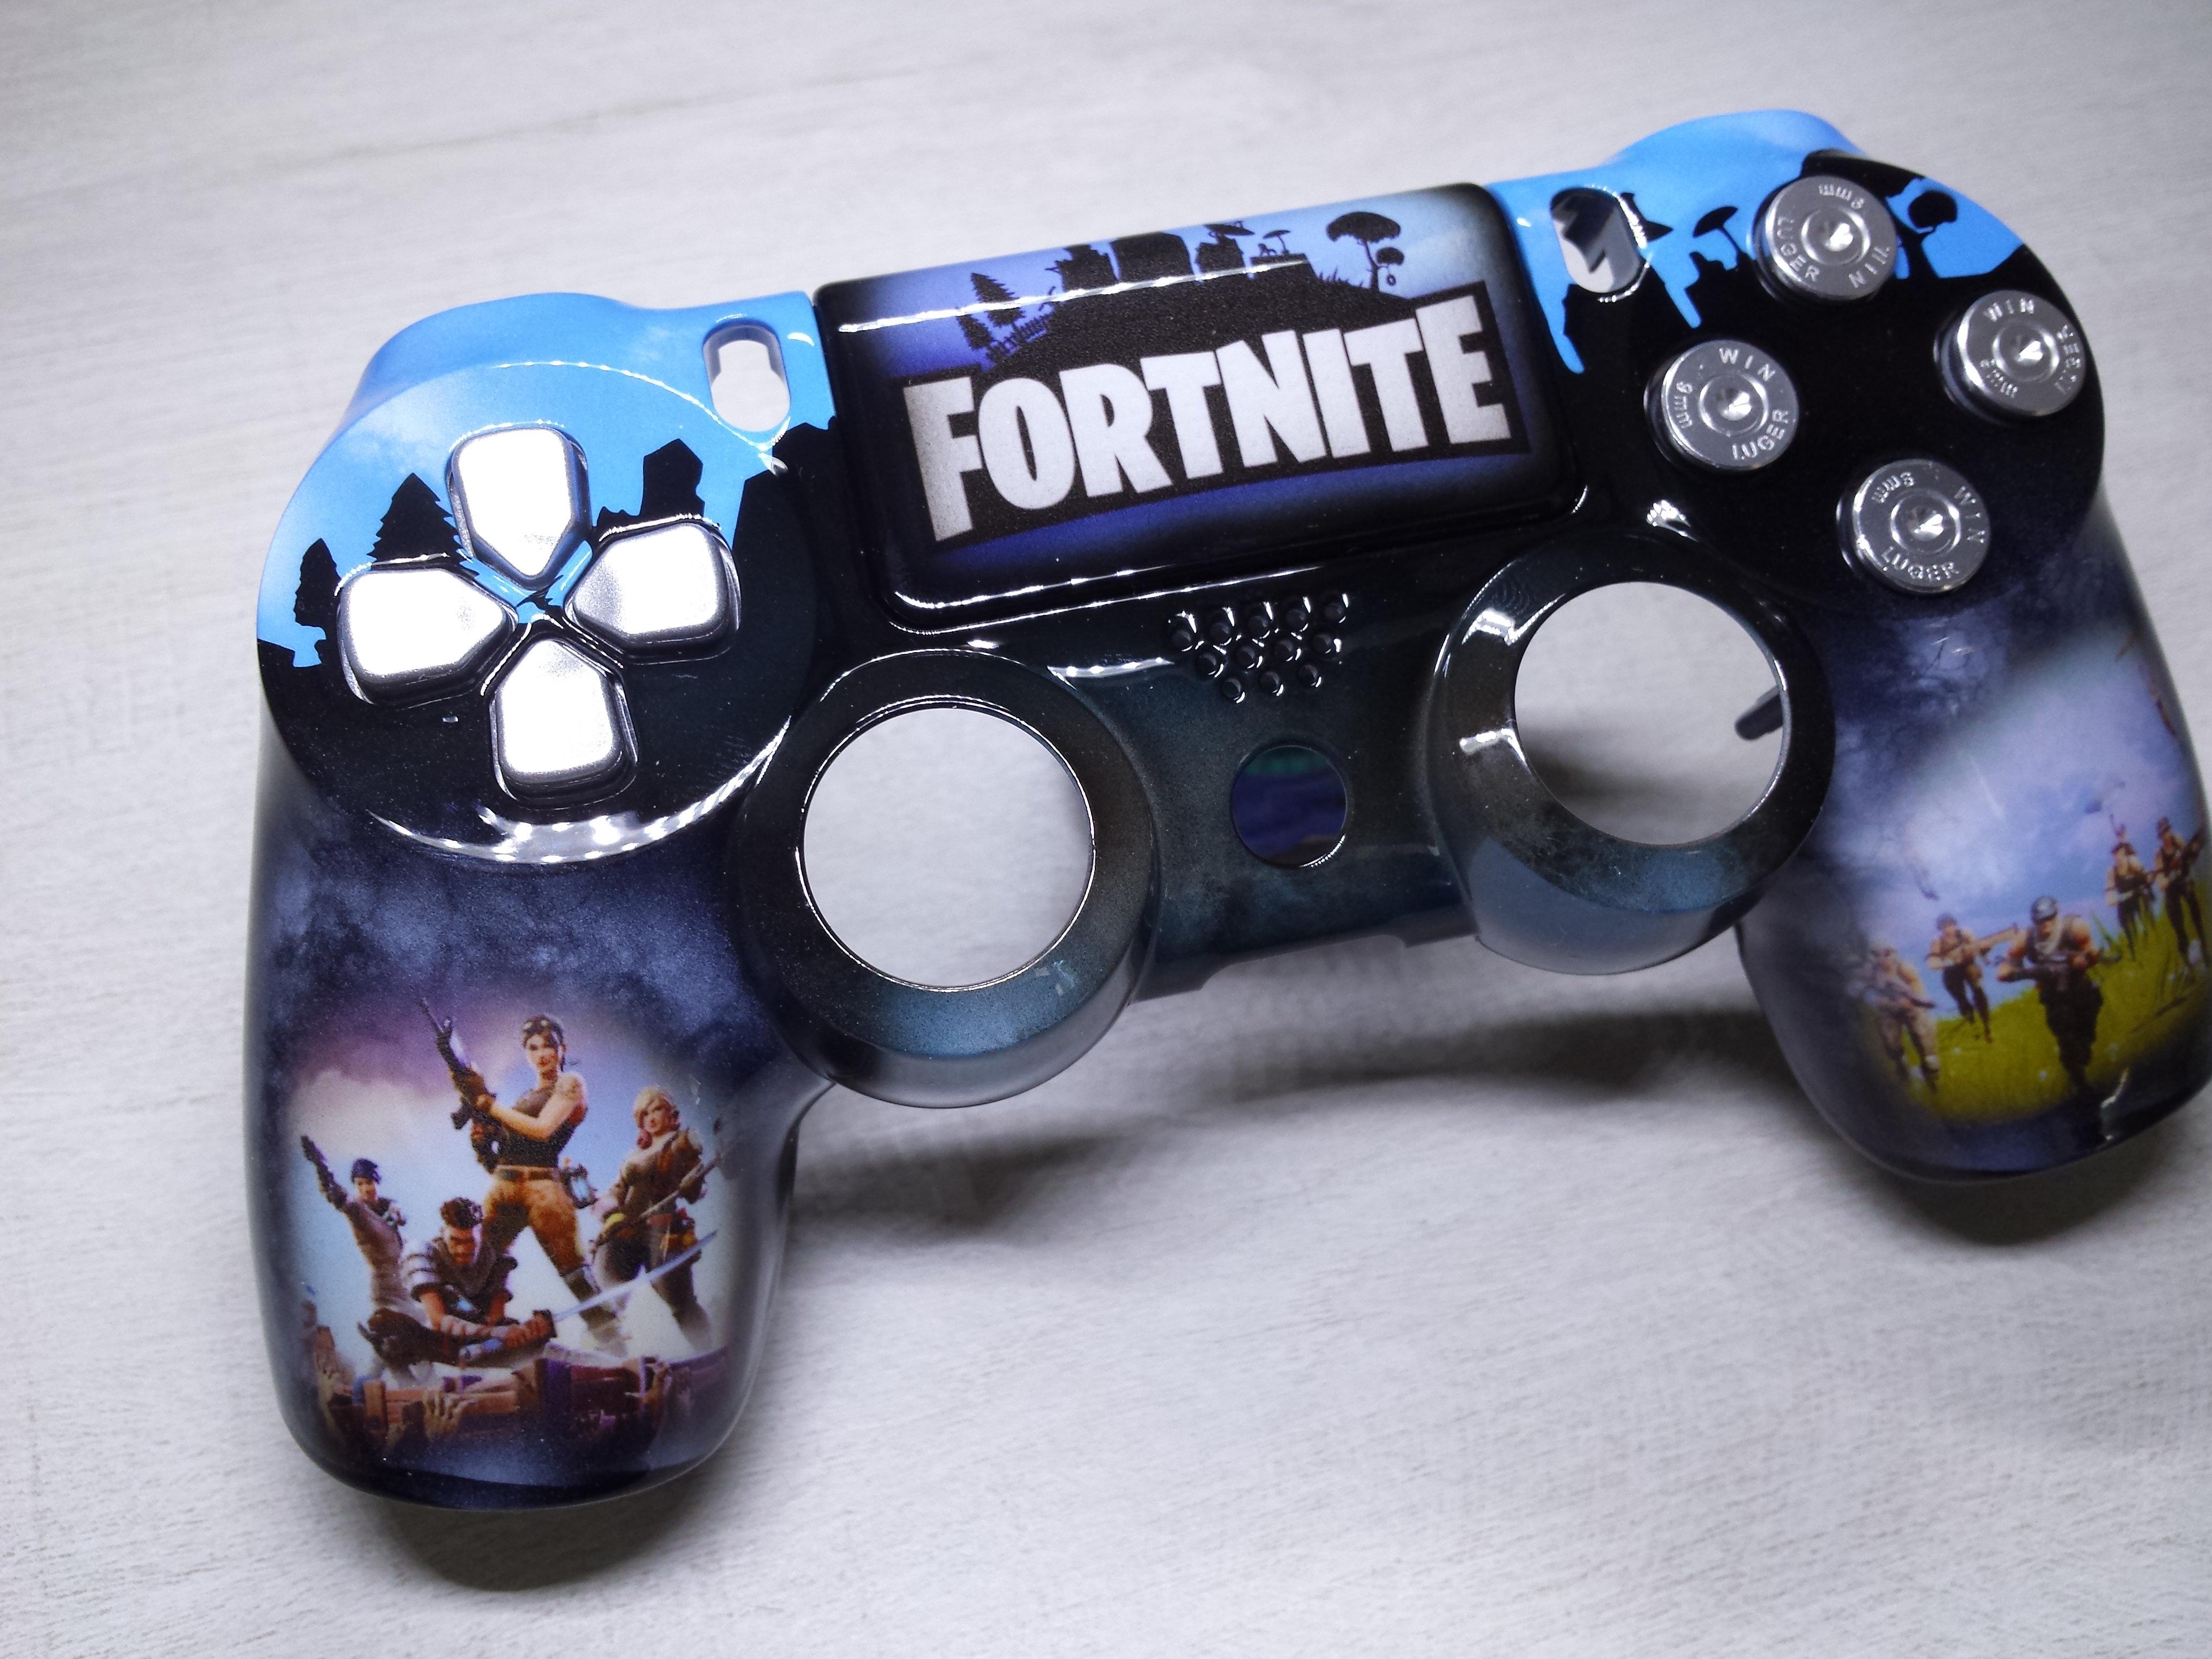 check out wholesale sales new images of Coque Manette PS4 Custom à l'aérographe !!! Dualshock 4 Sixaxis ! Fortnite